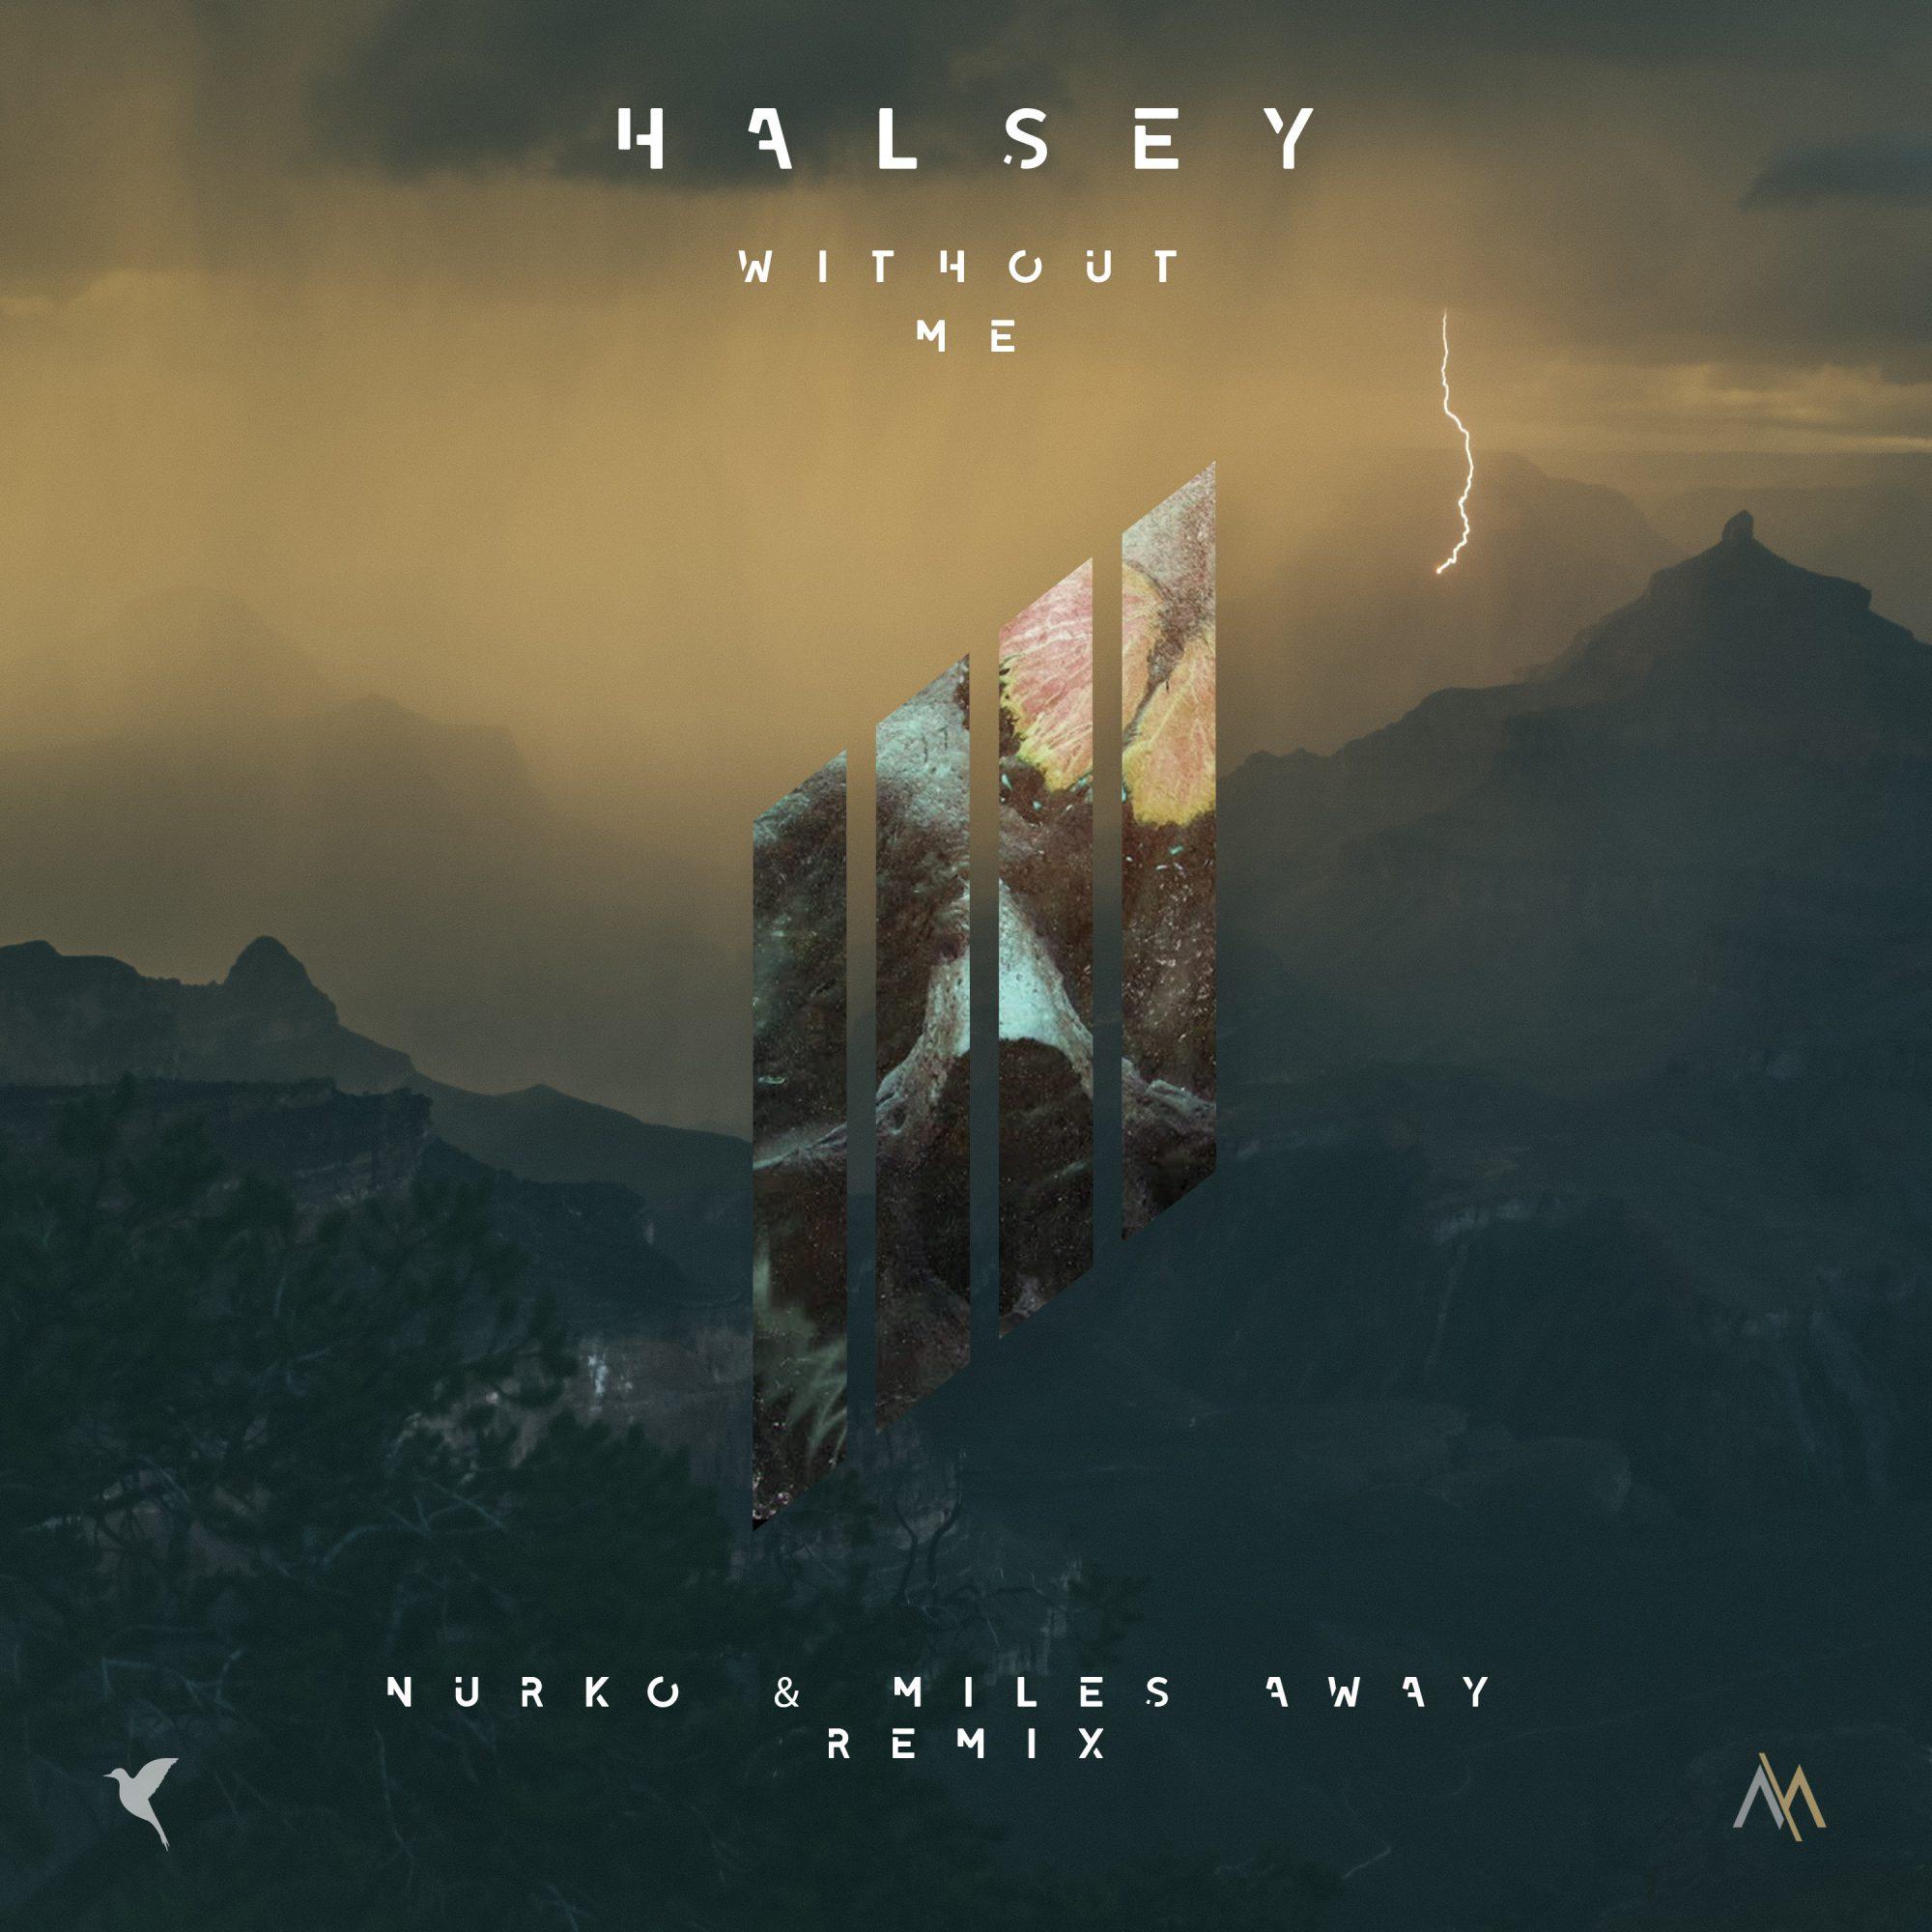 دانلود آهنگ جدید HALSEY Without Me